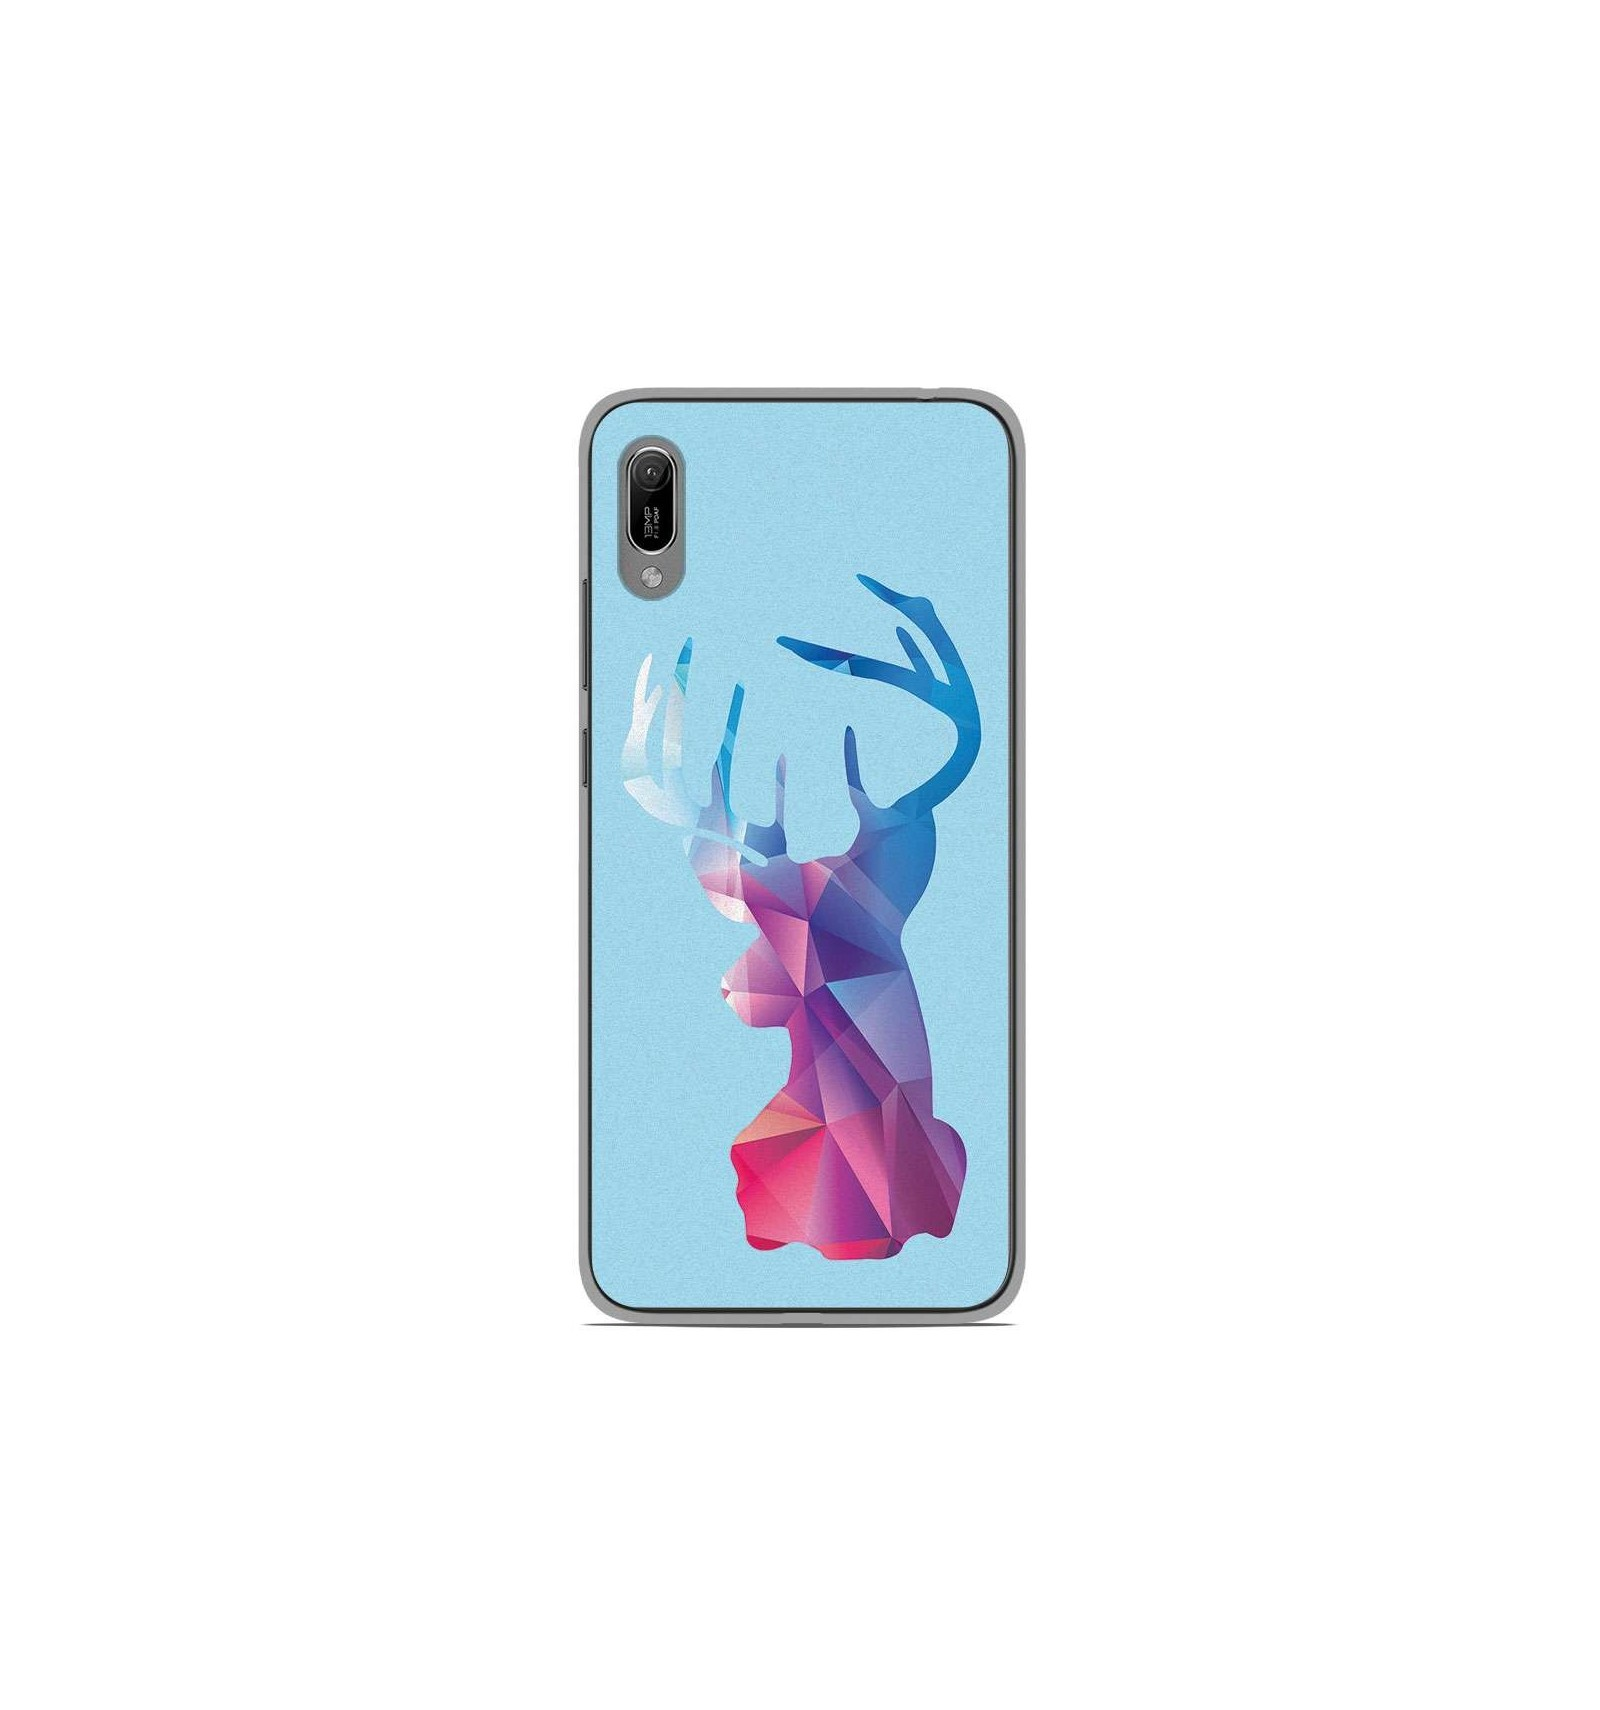 Coque en silicone Huawei Y6 2019 - Cerf Hipster Bleu